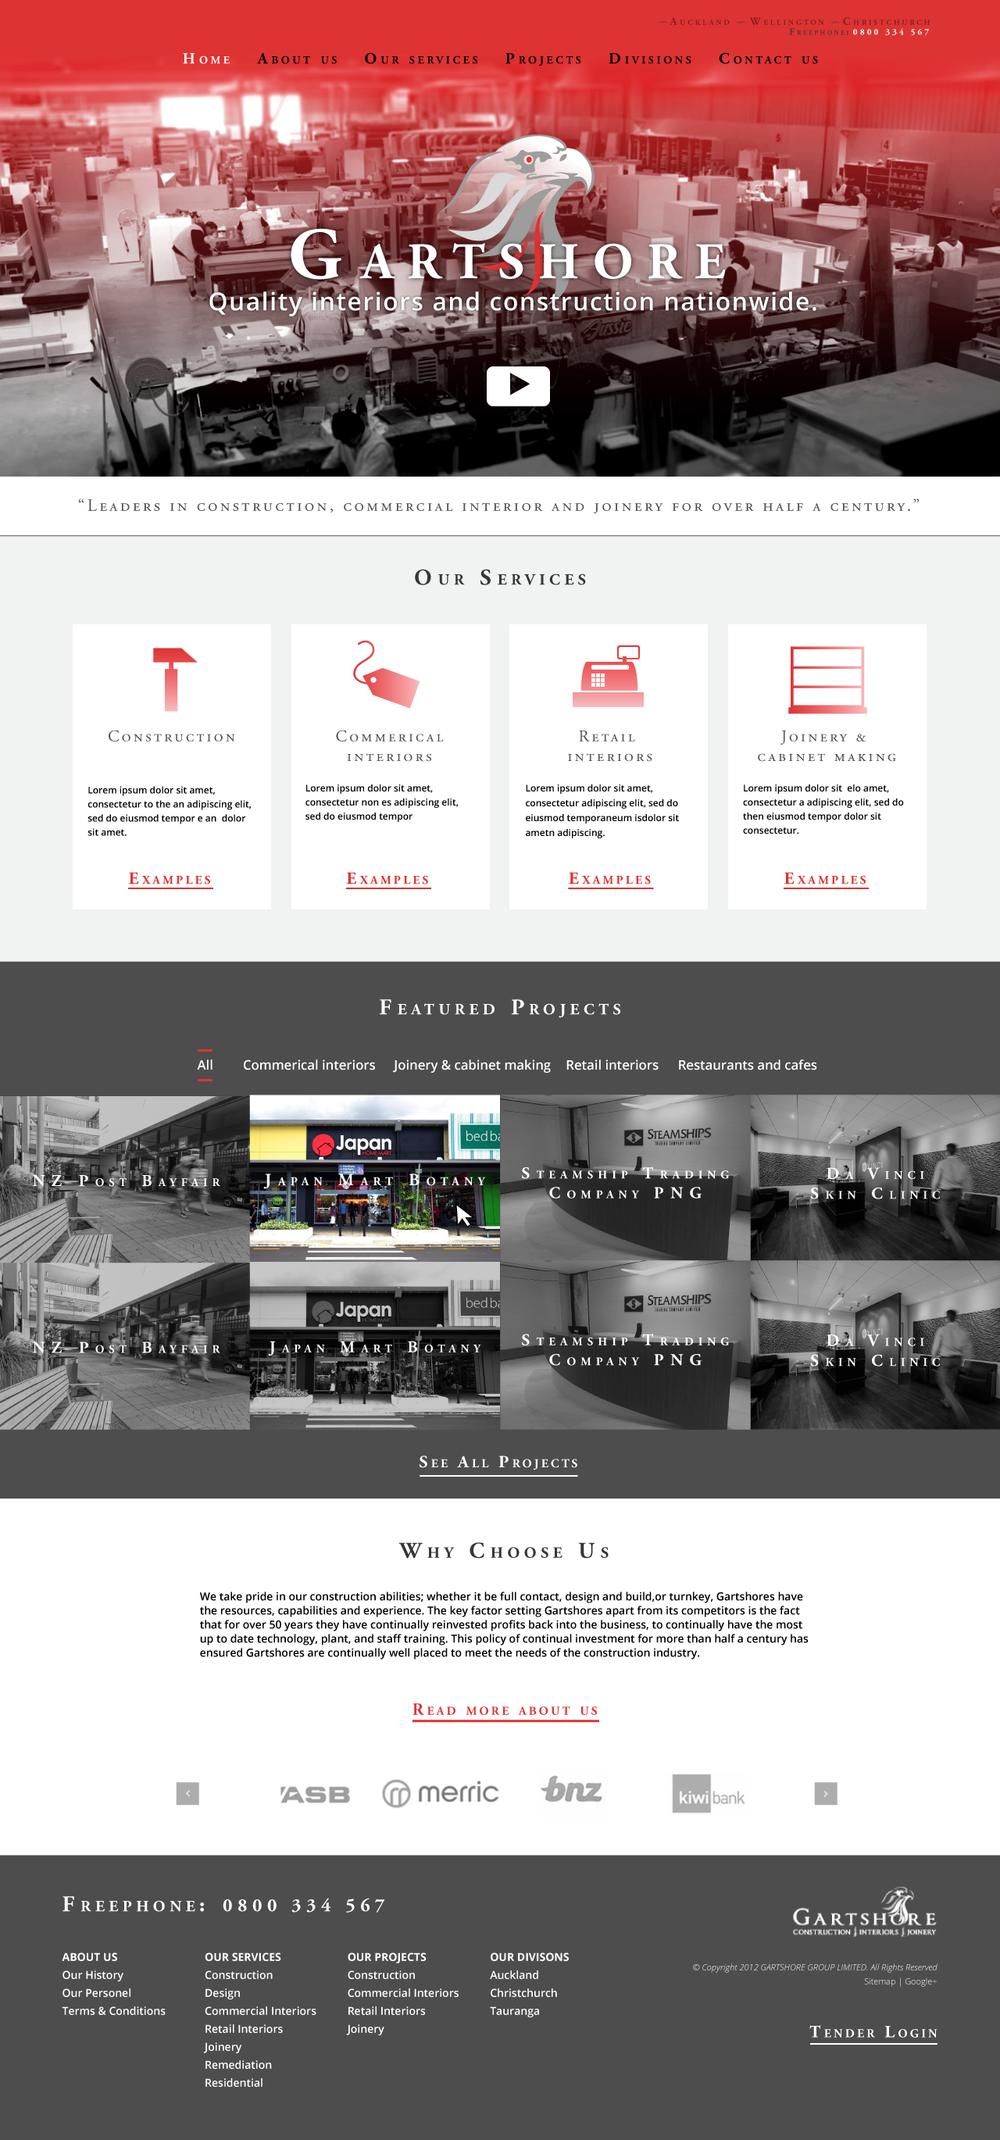 Gartshore-webdesign-4-mainpg.png